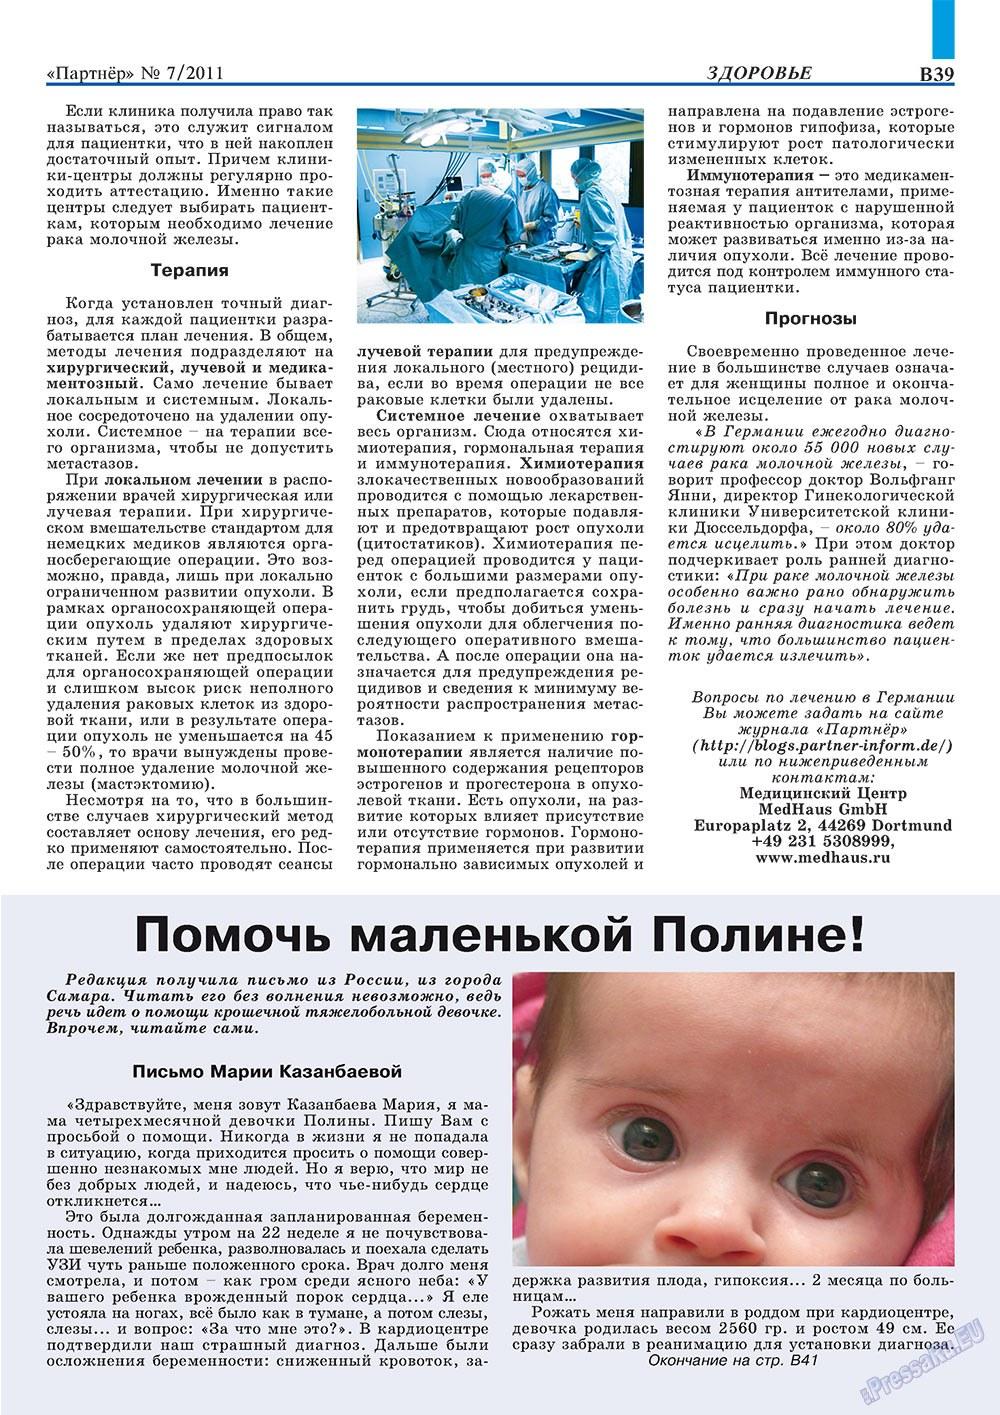 Партнер-север (журнал). 2011 год, номер 7, стр. 49